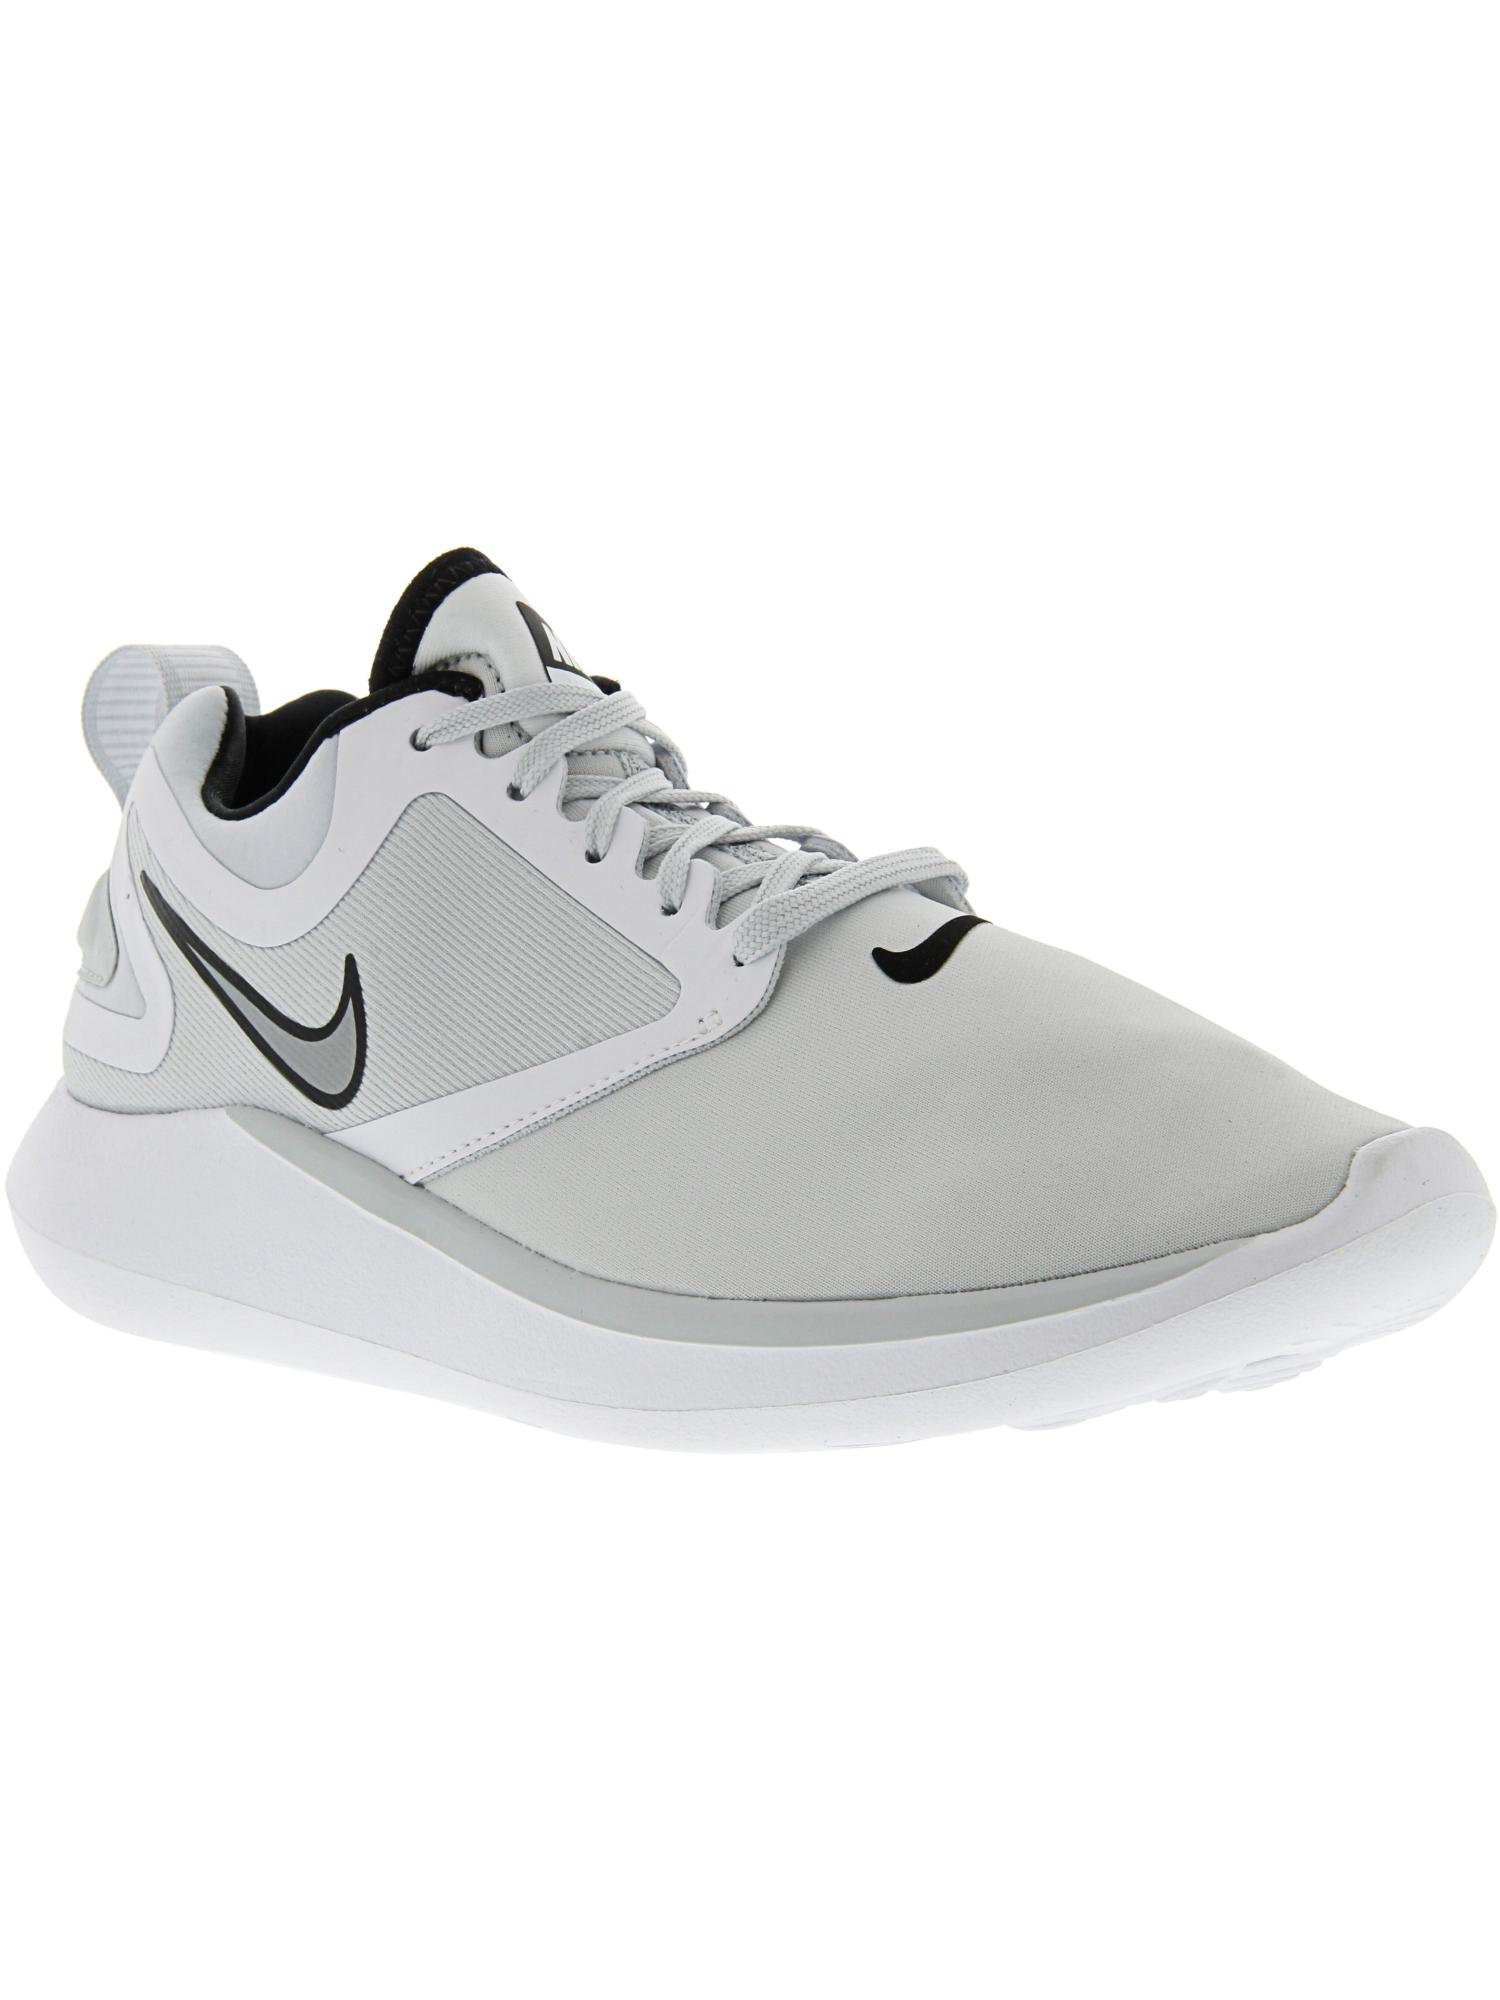 huge selection of 1978e c65f0 Nike-Women-039-s-Lunarsolo-El-Ankle-High-